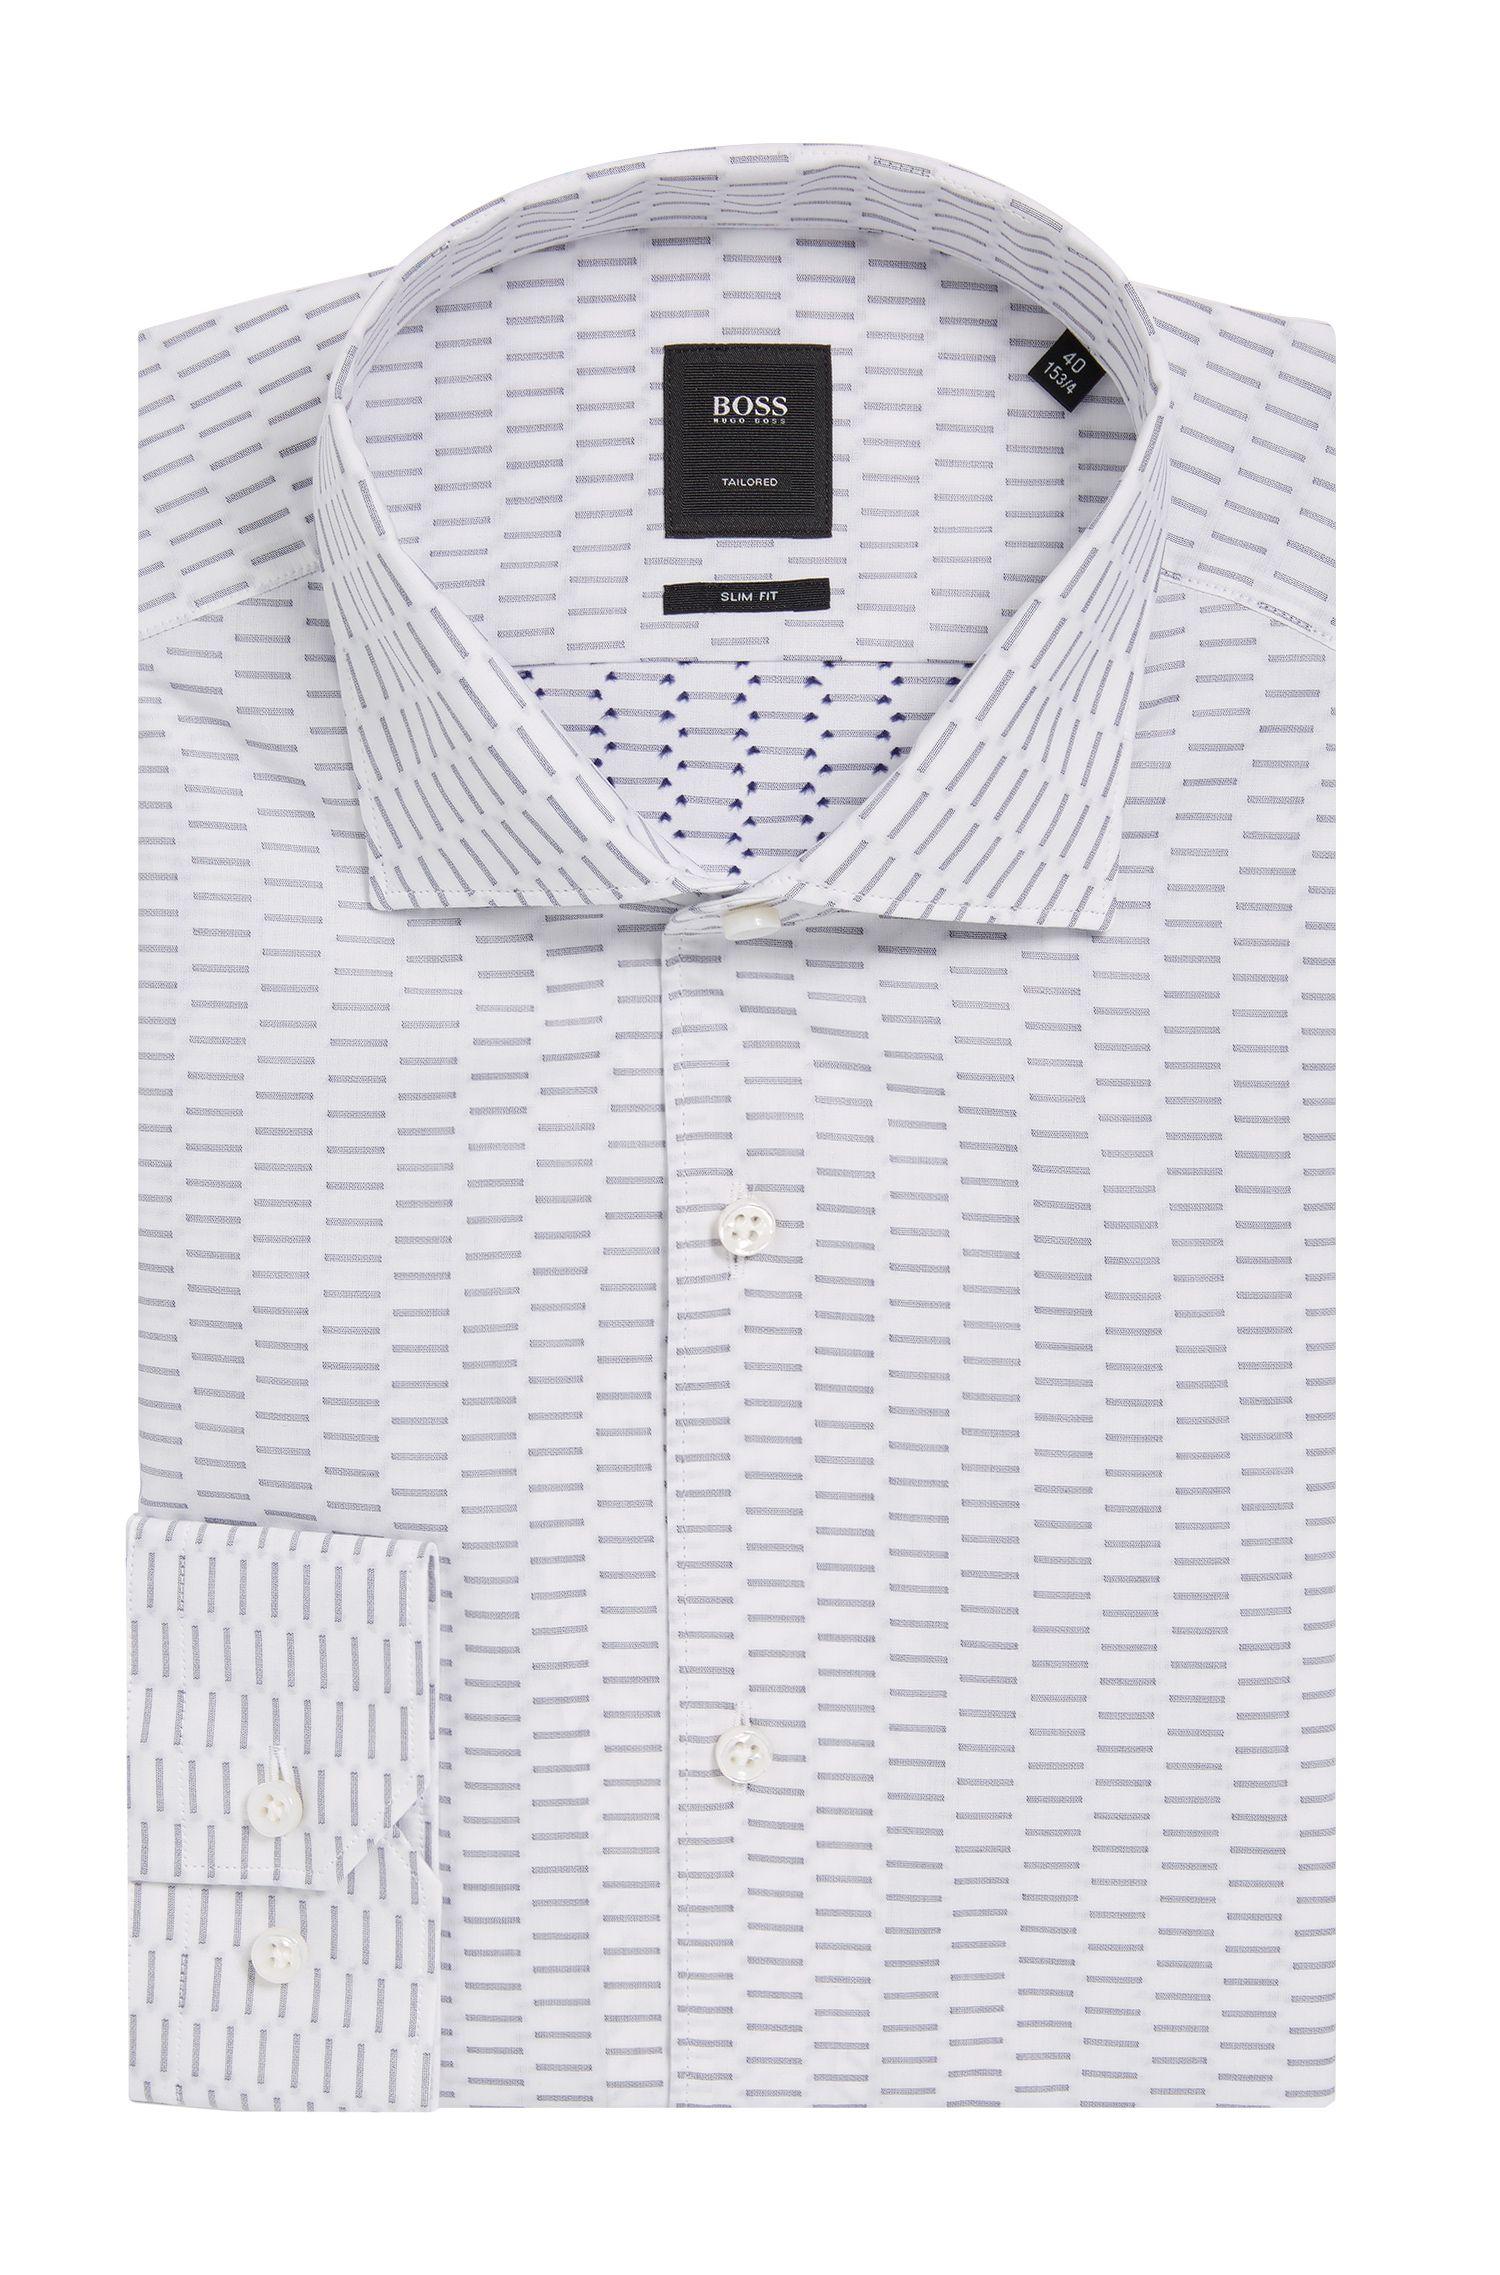 Dash Print Cotton Dress Shirt, Slim Fit   T-Steven